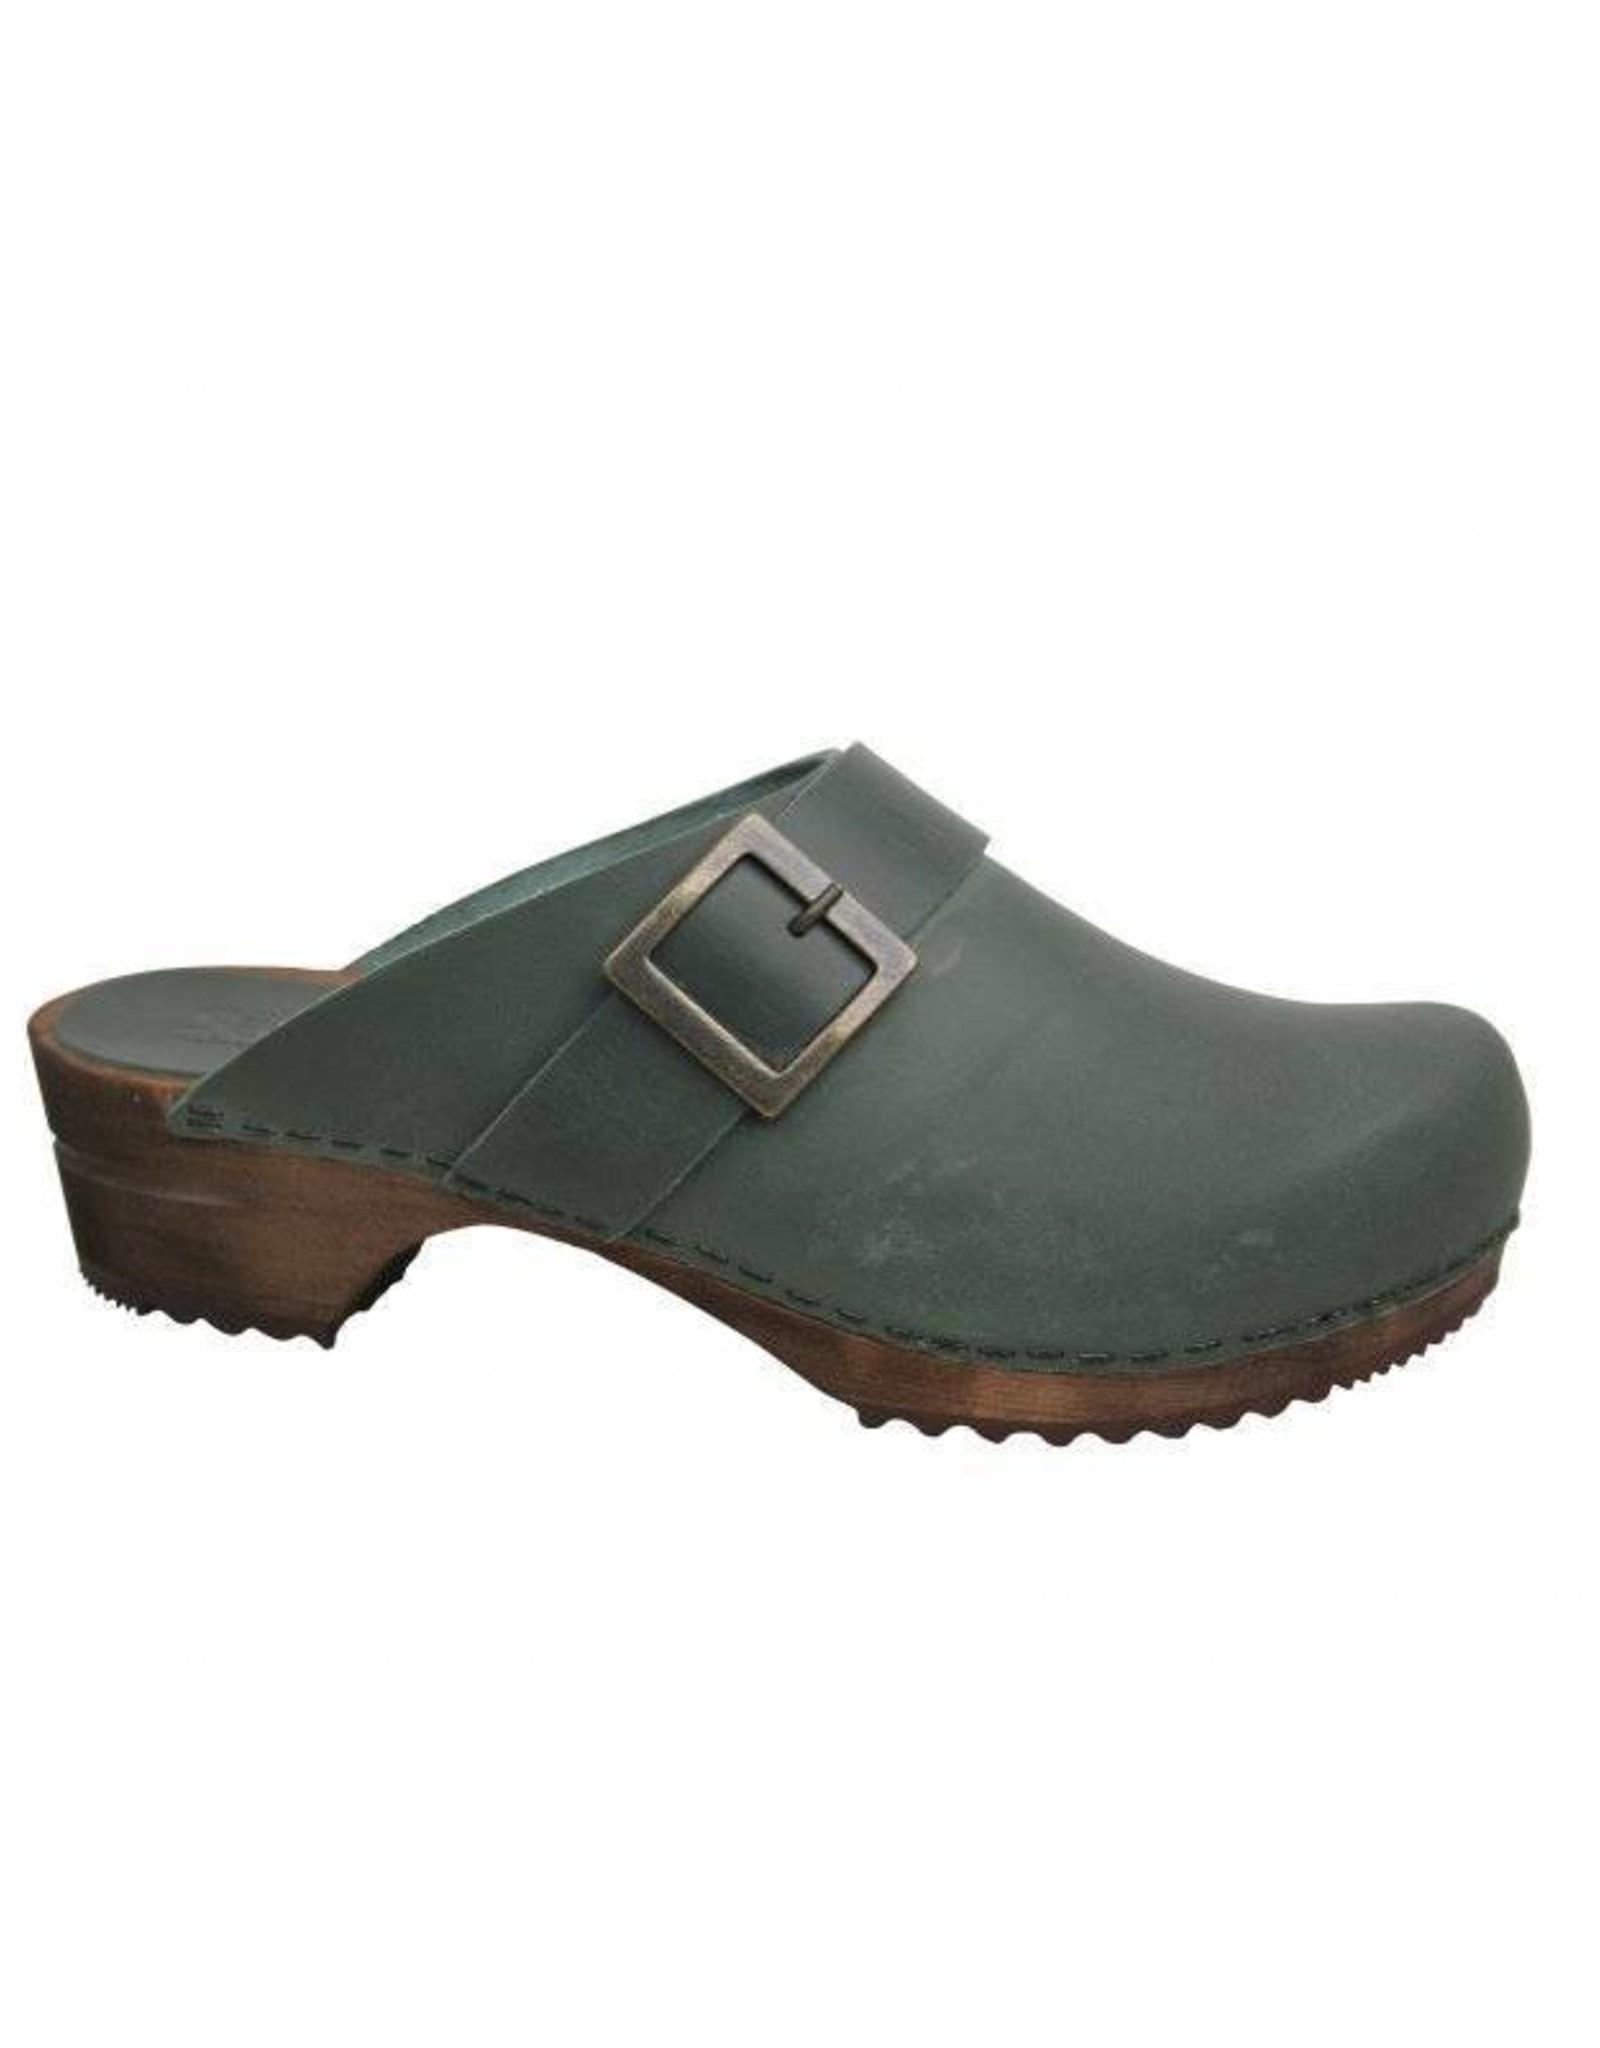 Sanita Urban kaki groen